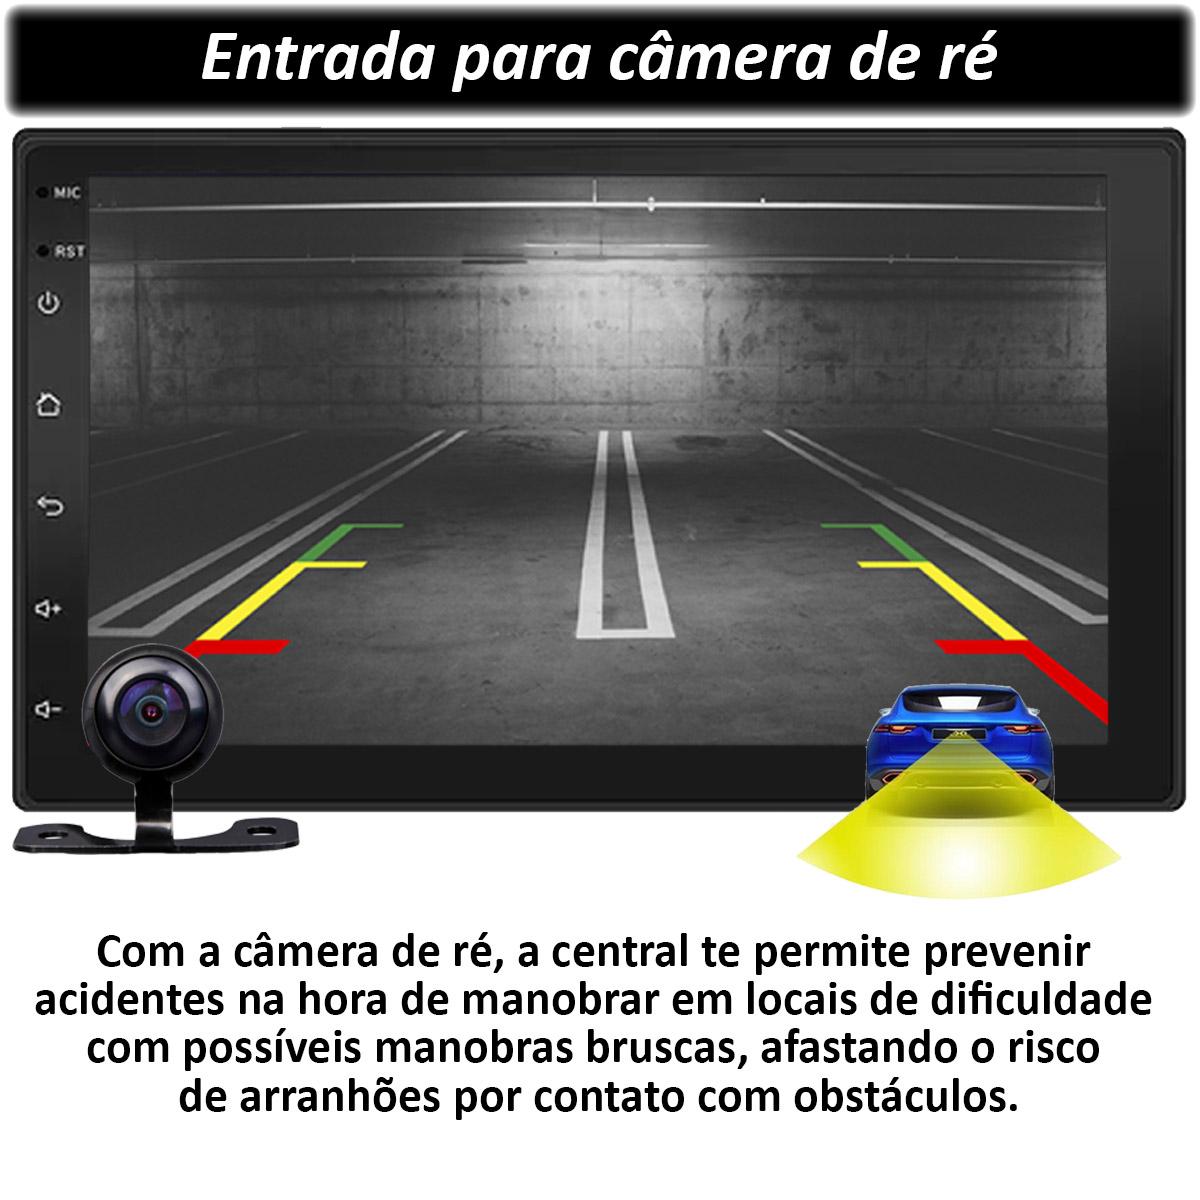 Central Multimídia Renault Duster Muzik Android com Câmera de Ré 7 Polegadas 2 Din Moldura Poliparts